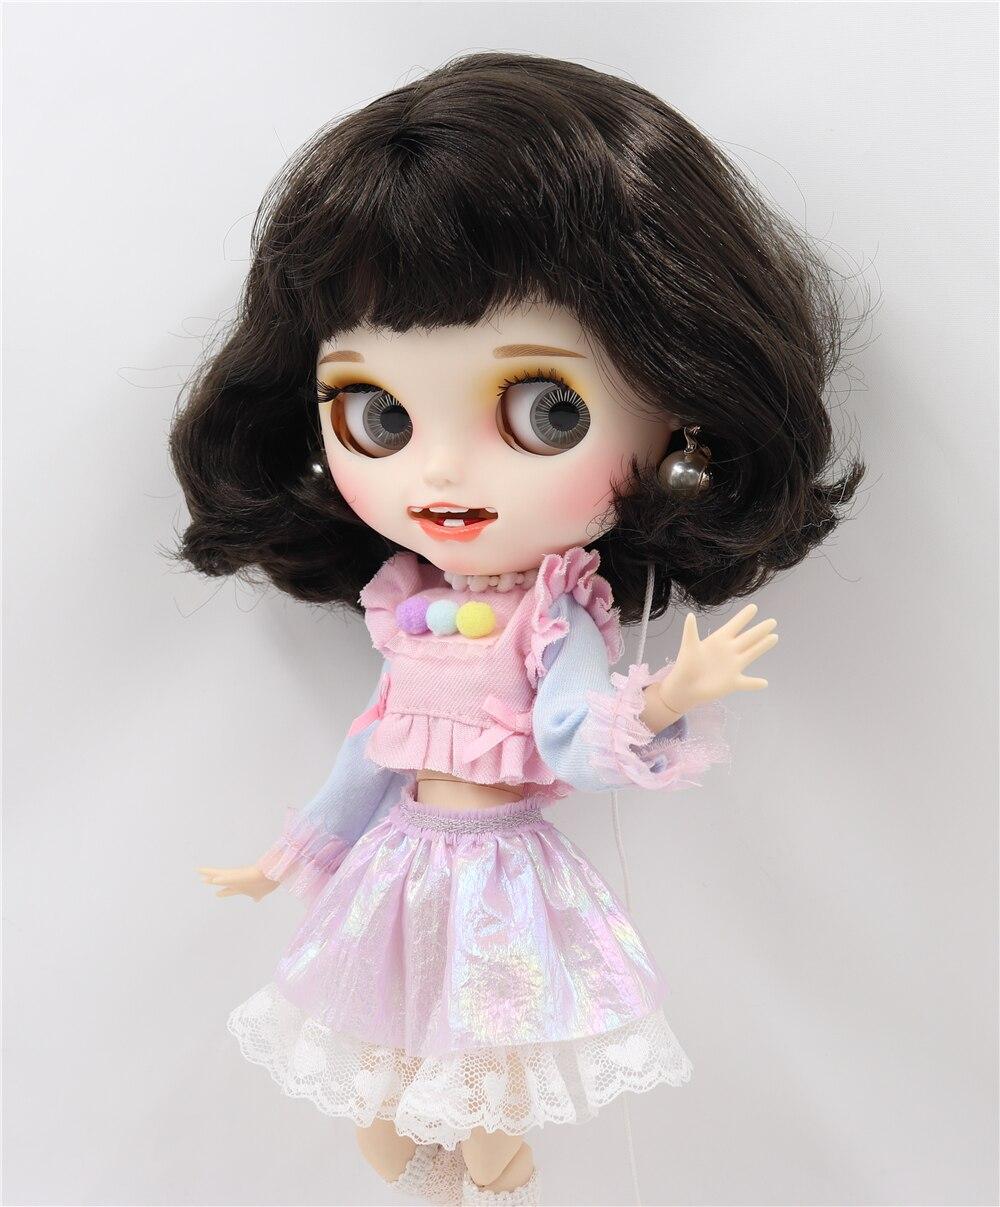 Jovita – Premium Custom Blythe Doll with Smiling Face 2